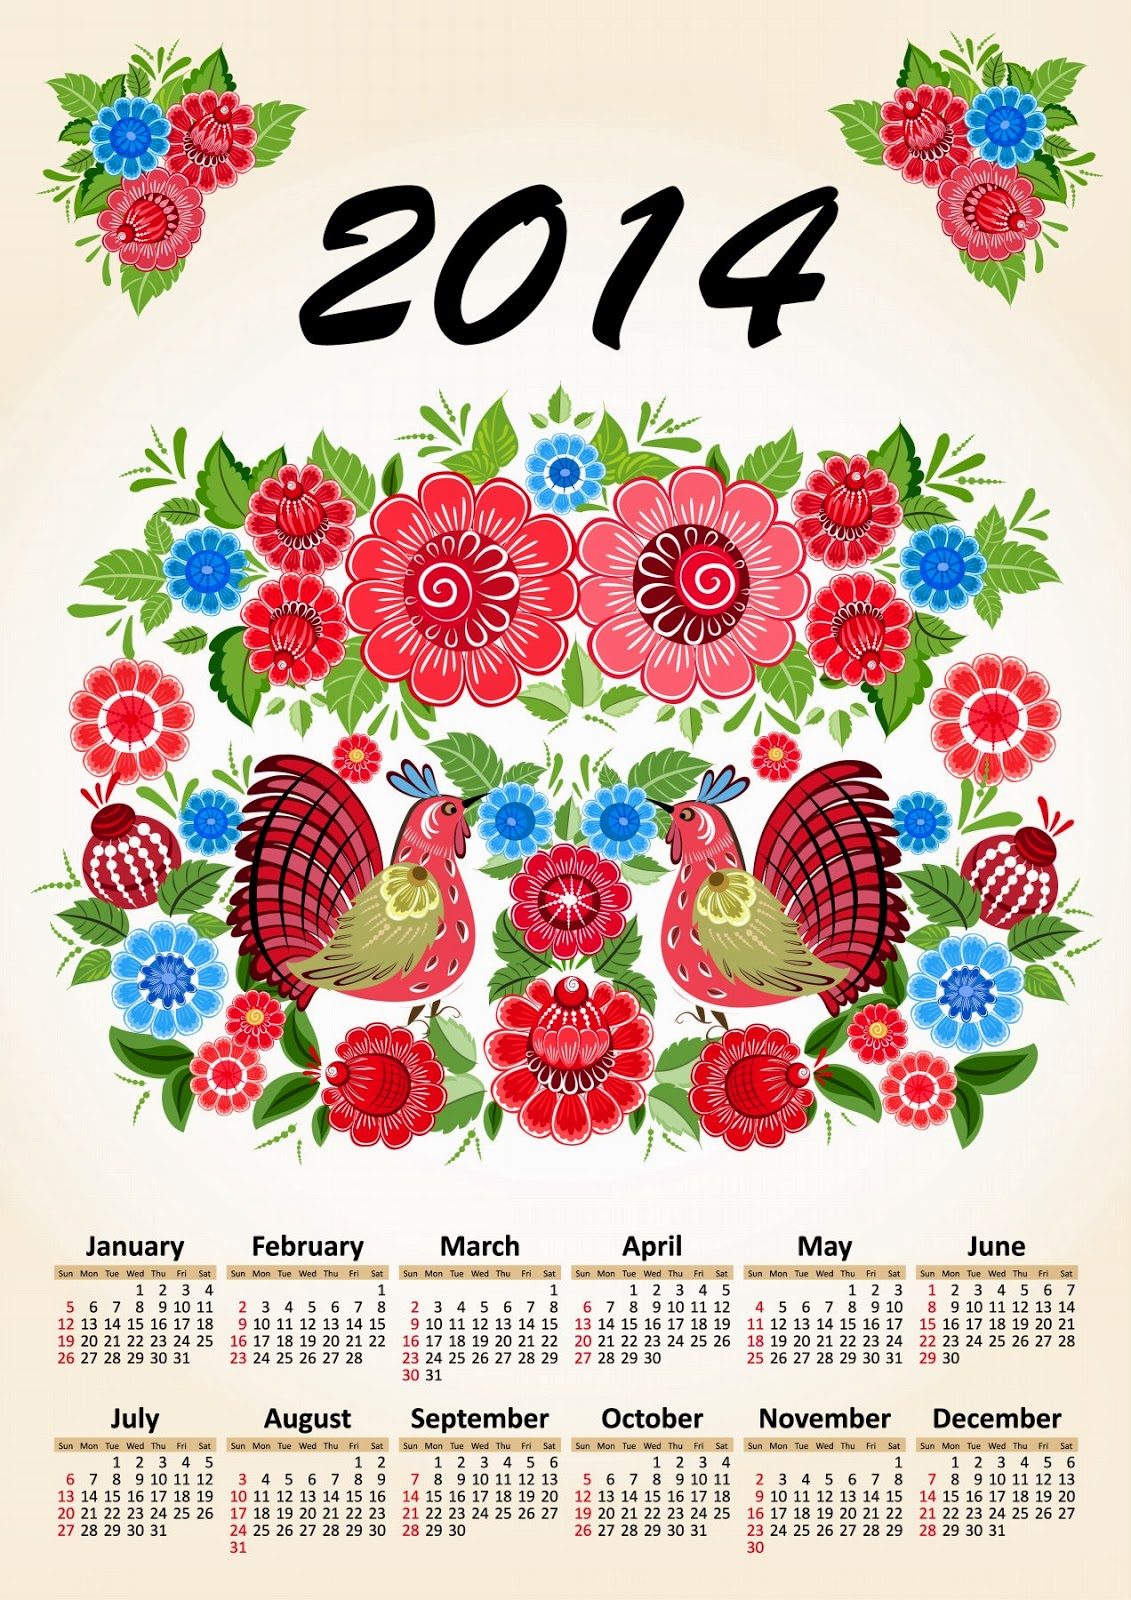 Flowers 2014 Calendar Printable